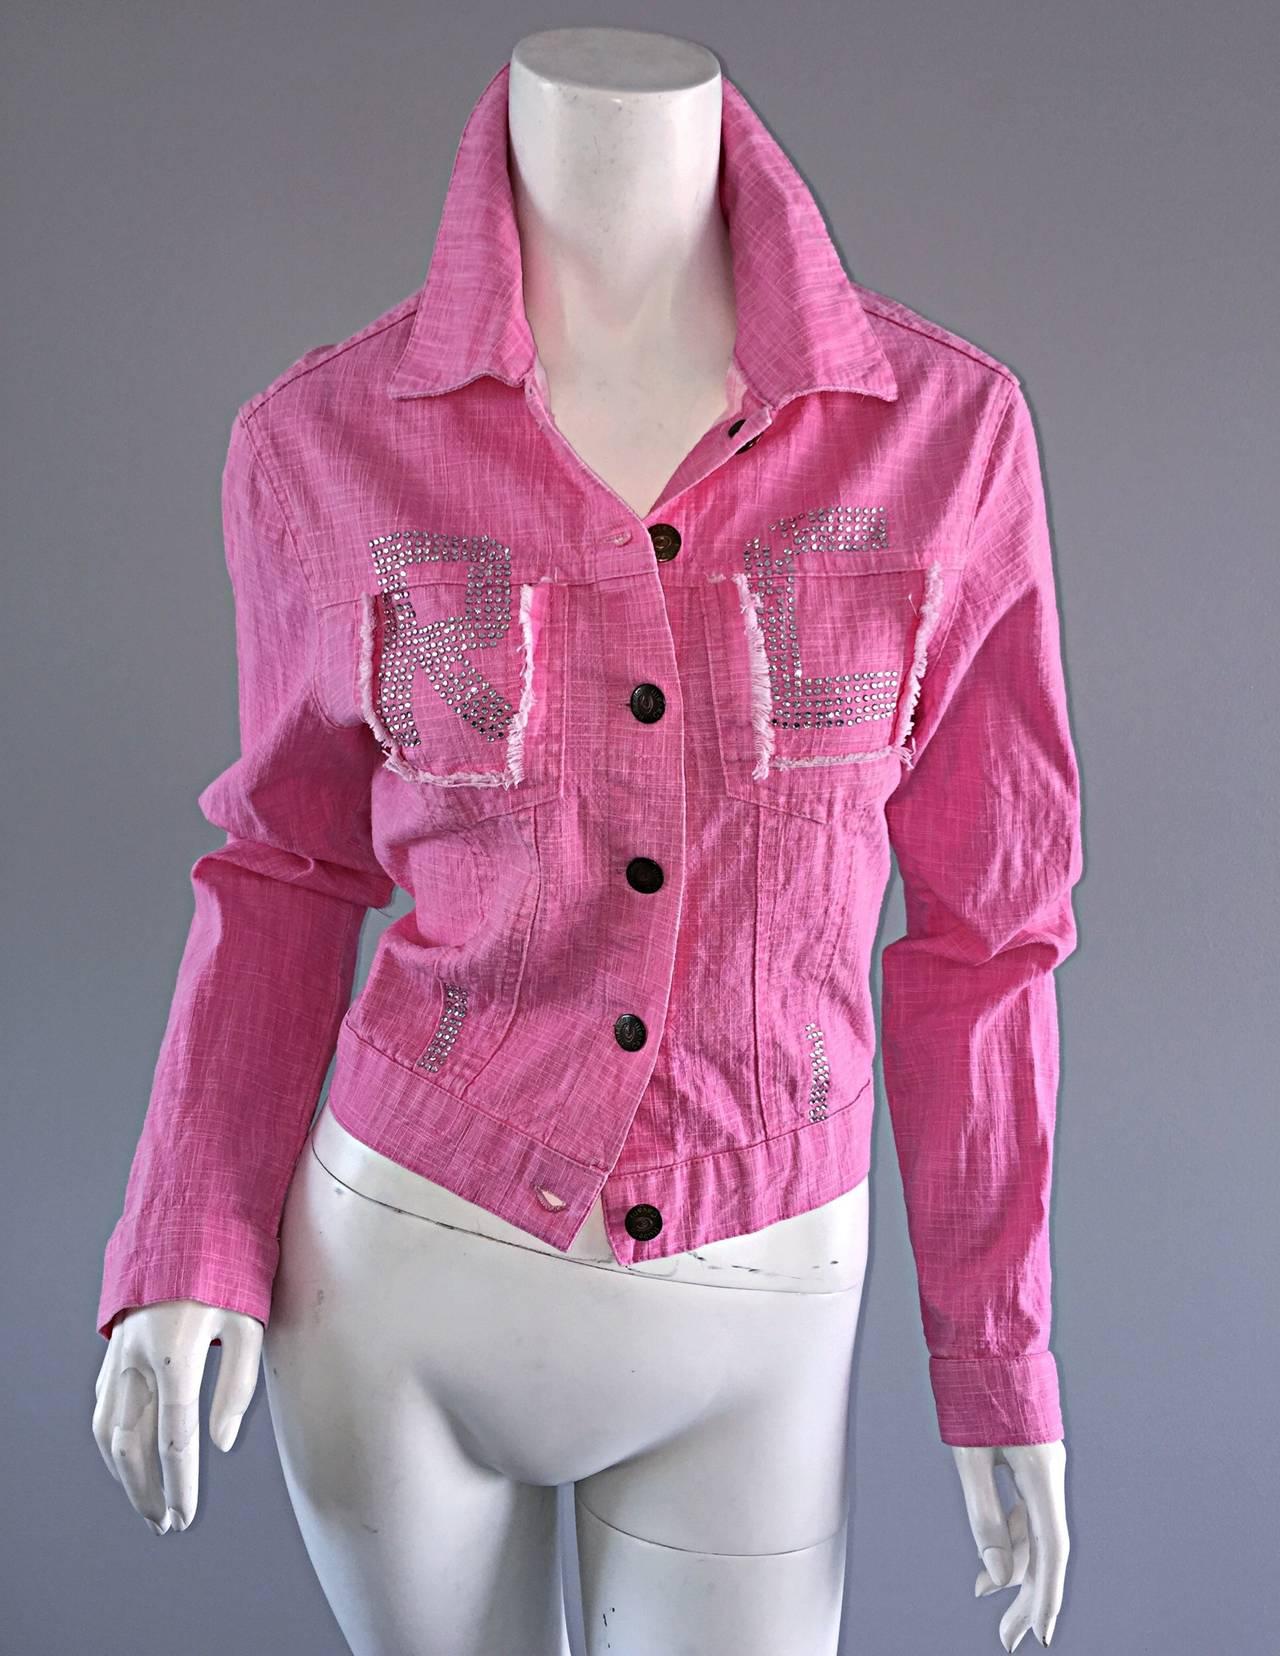 1990s Vintage Roberto Cavalli Pink Denim Jean Jacket + ' R C ' Rhinestones 9